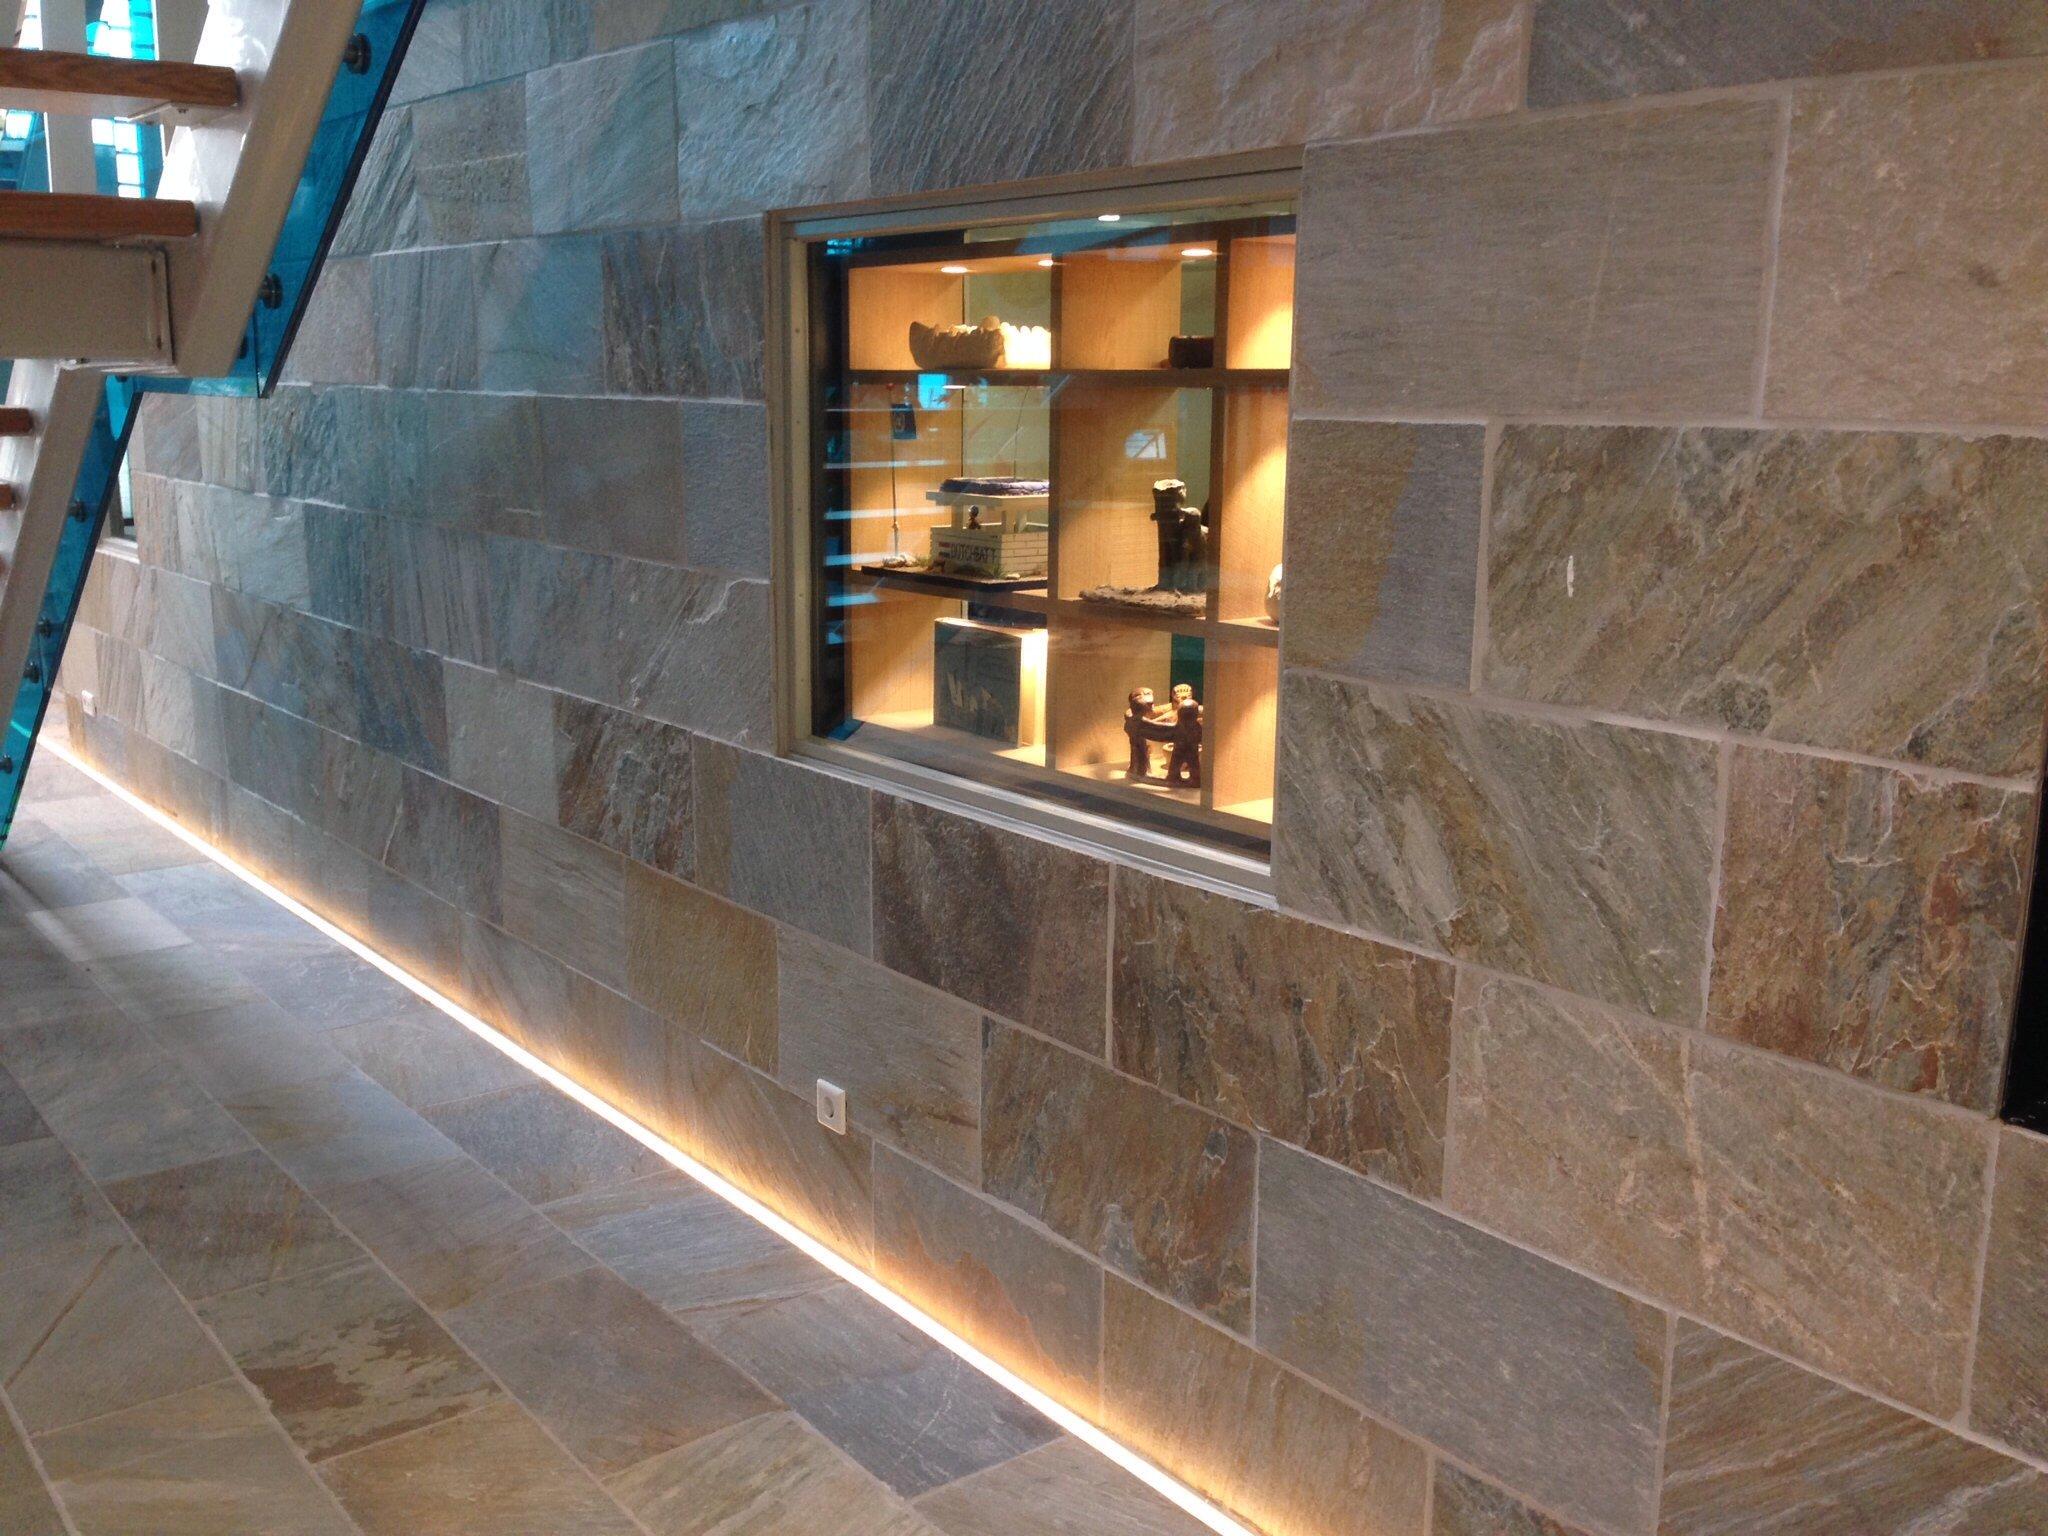 Laminaat Tegels Bruin : Nibo stone kwartsiet tegels vloer wand product in beeld